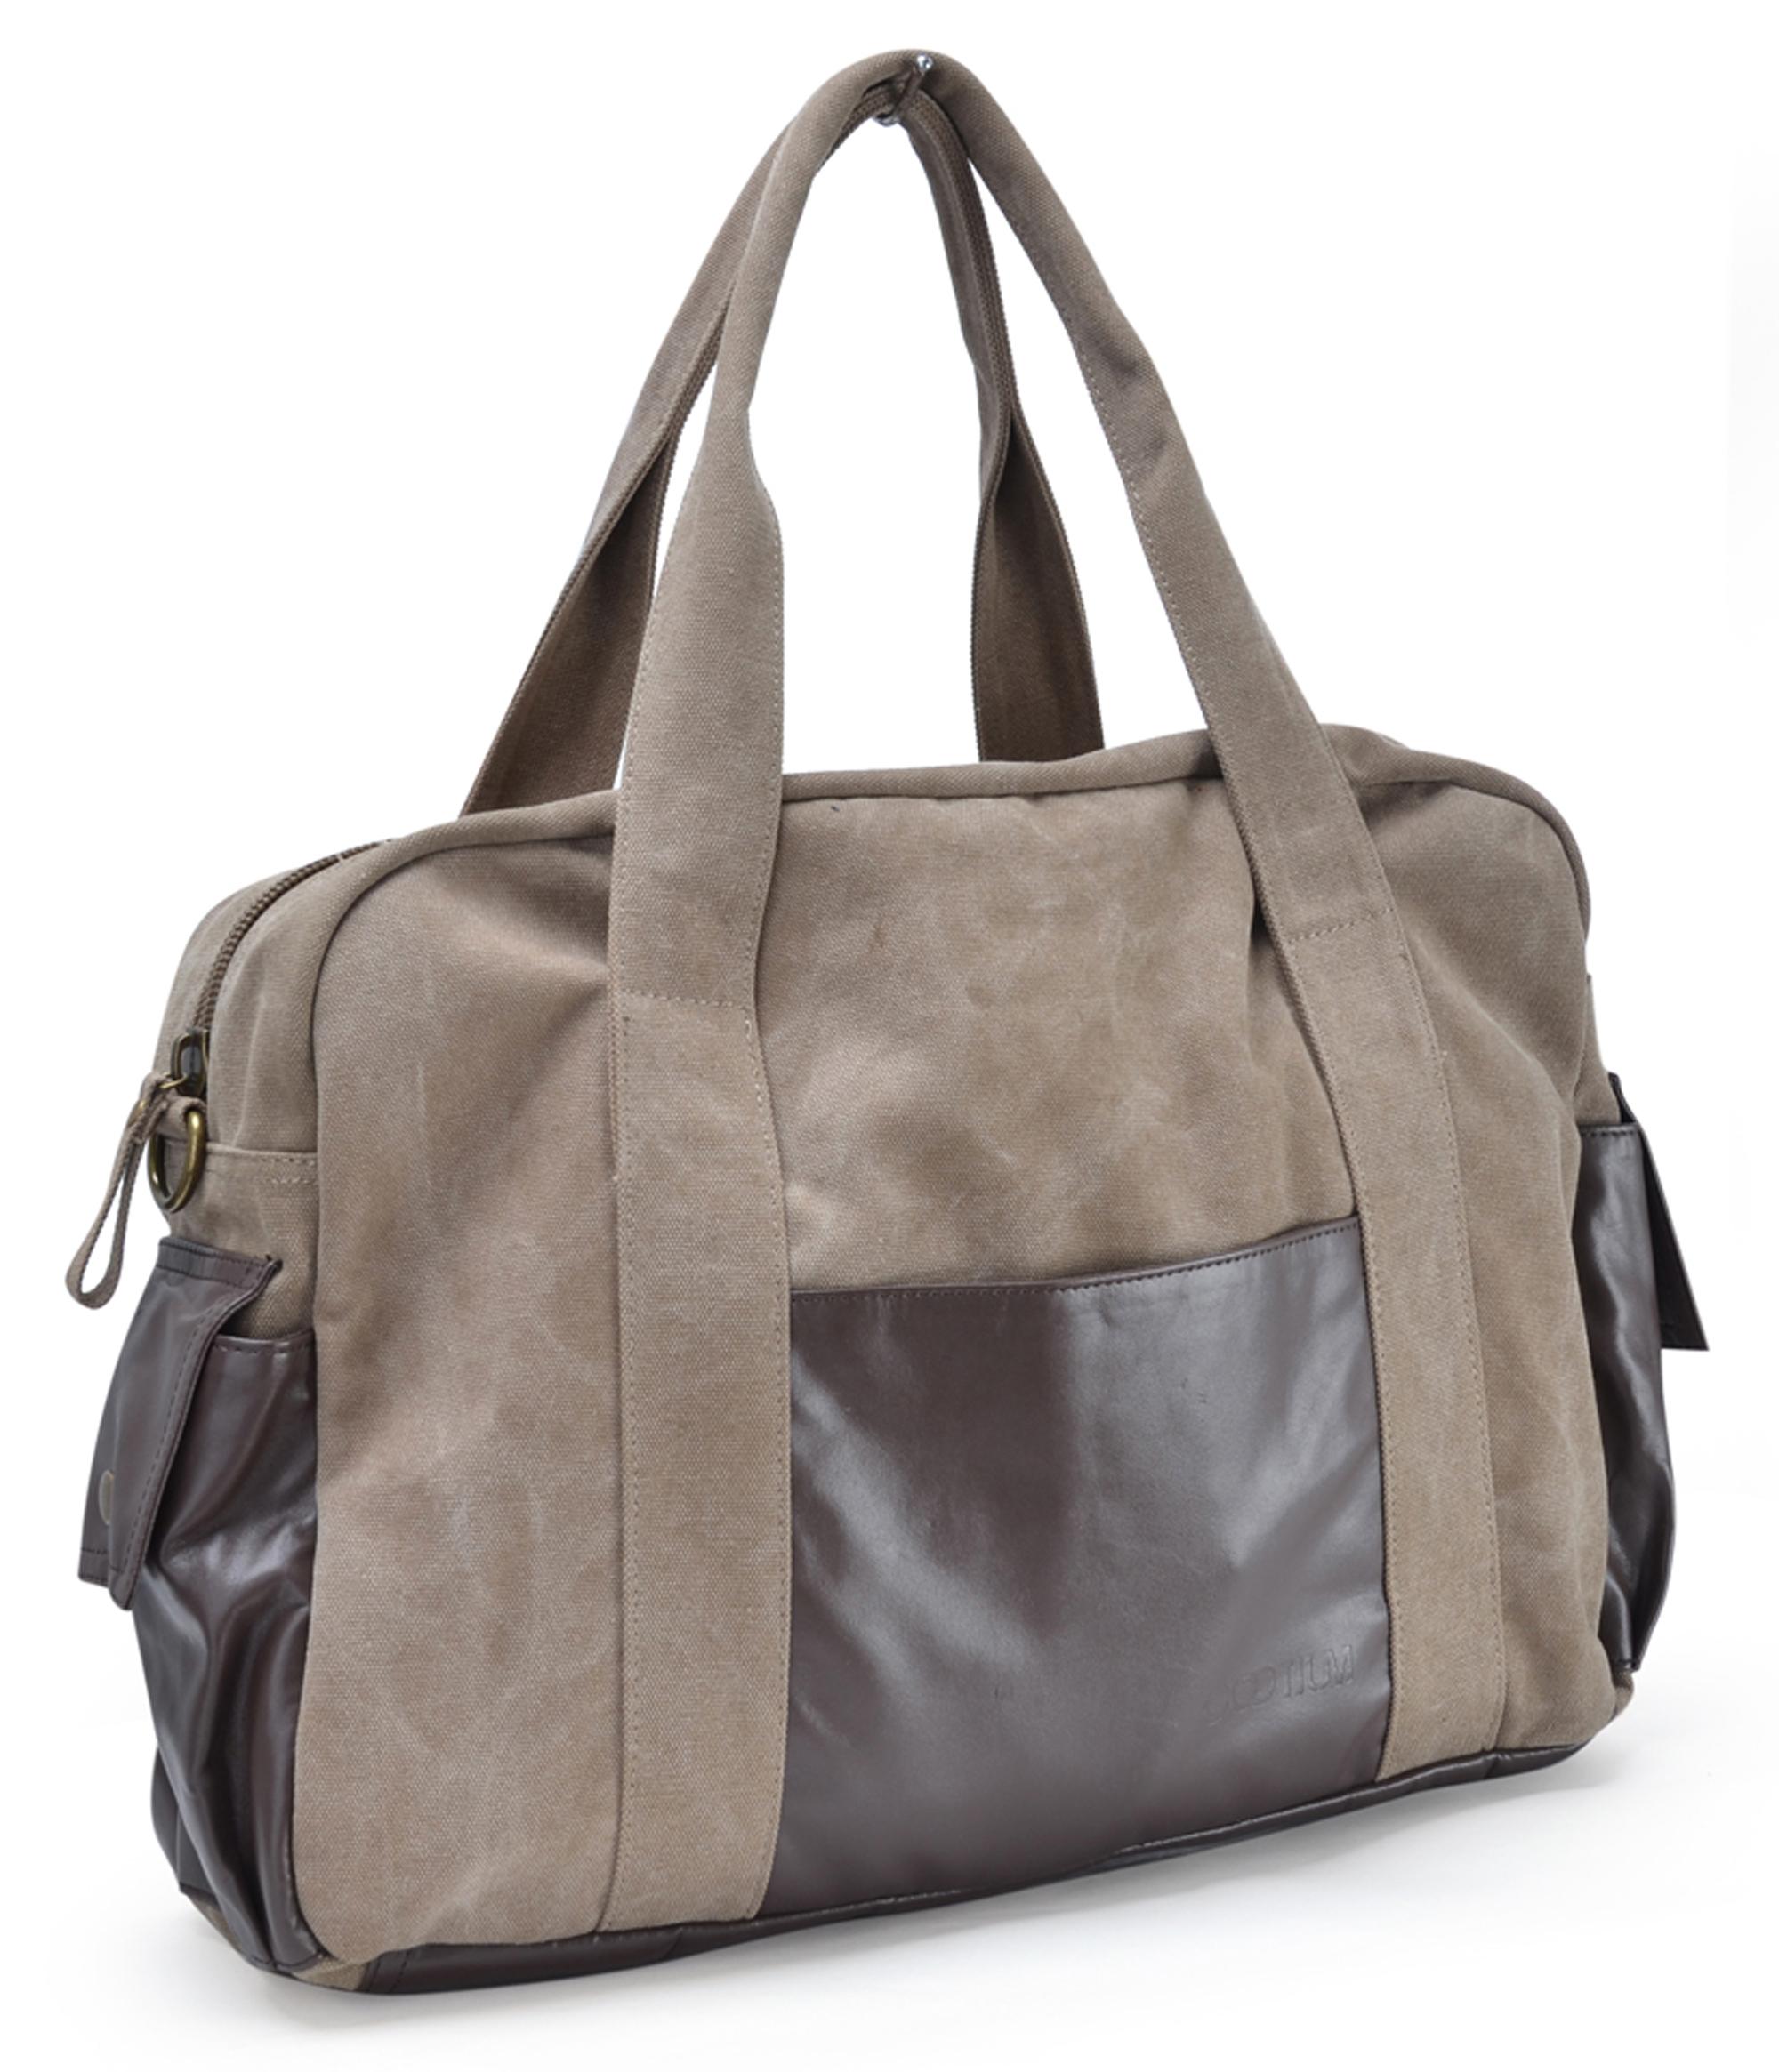 Gym Bag Briefcase: GOOTIUM Canvas Leather Travel Duffle Bags Sport Gym Bag